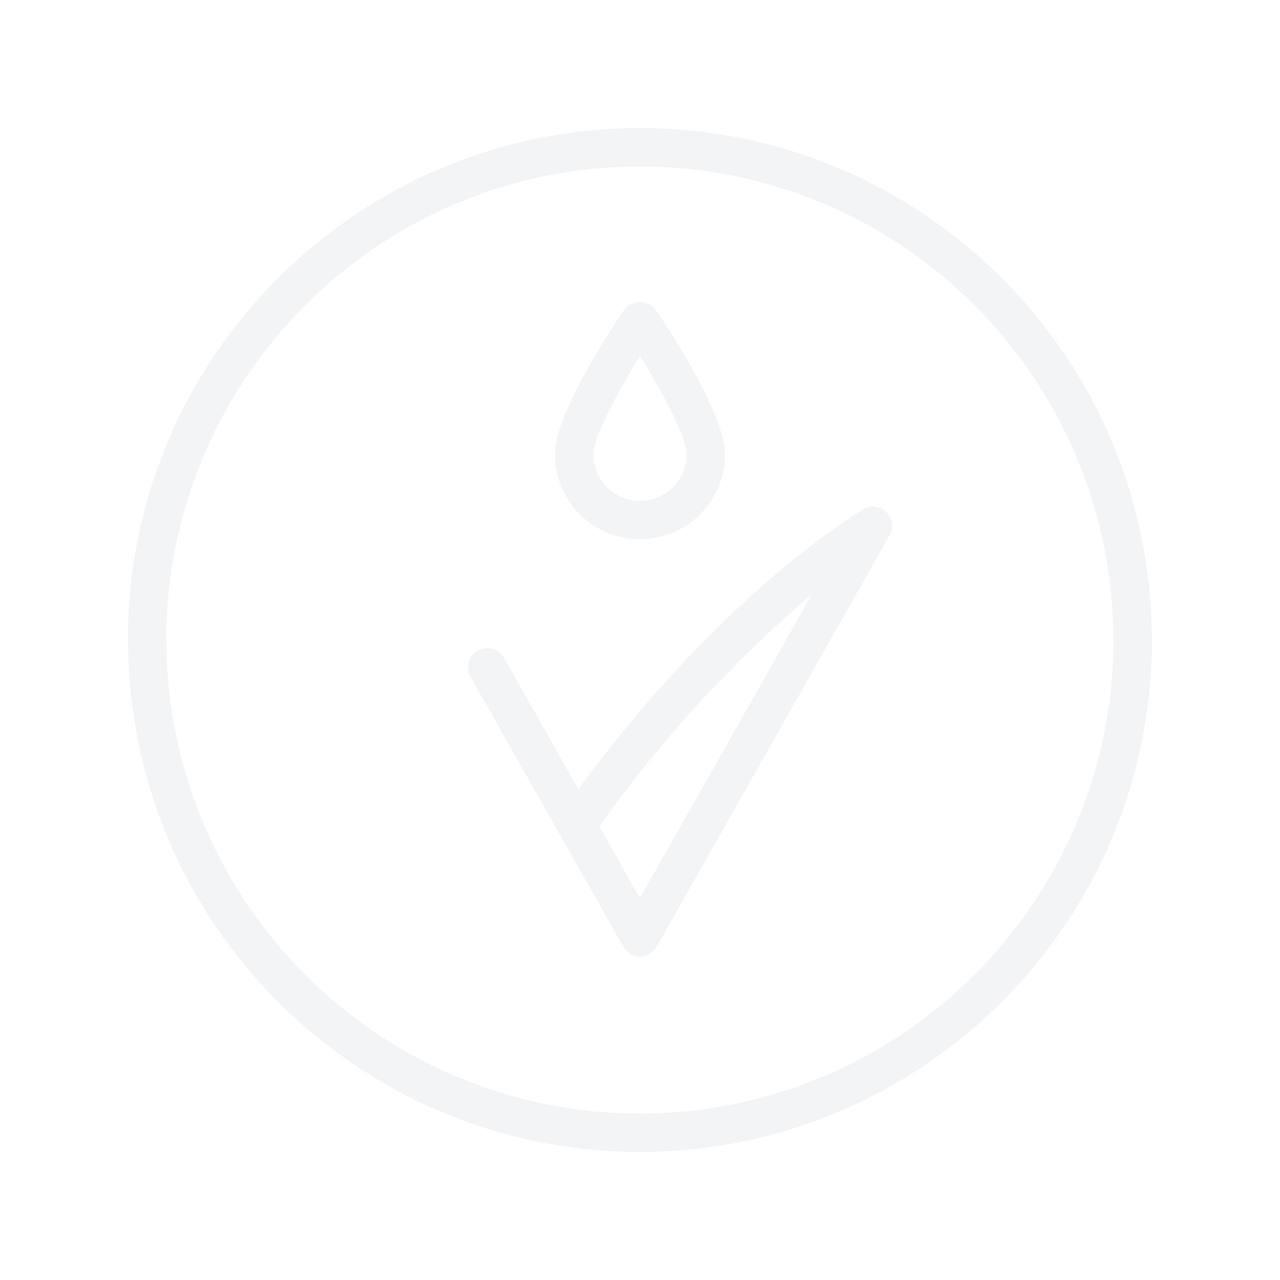 NARCISO RODRIGUEZ Bleu Noir For Him EDP 50ml